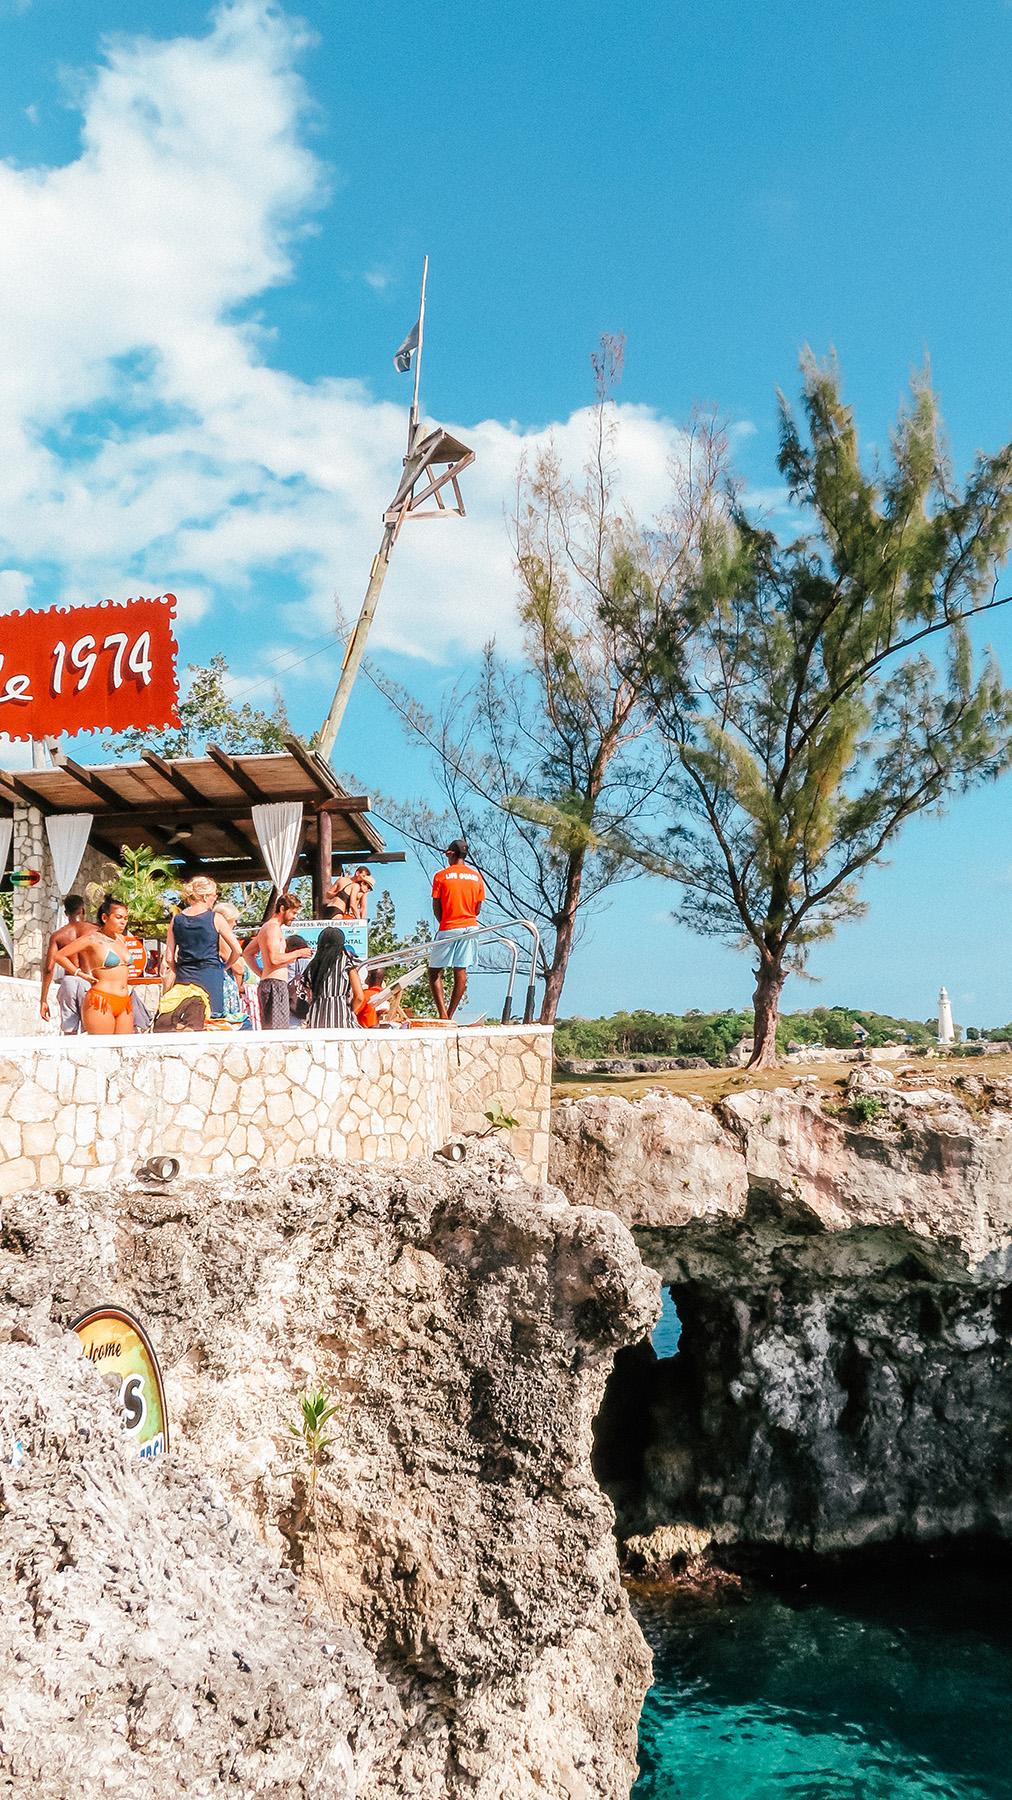 Mittelamerika Kreuzfahrt Montego Bay Jamaika Ricks Cafe Negril 2